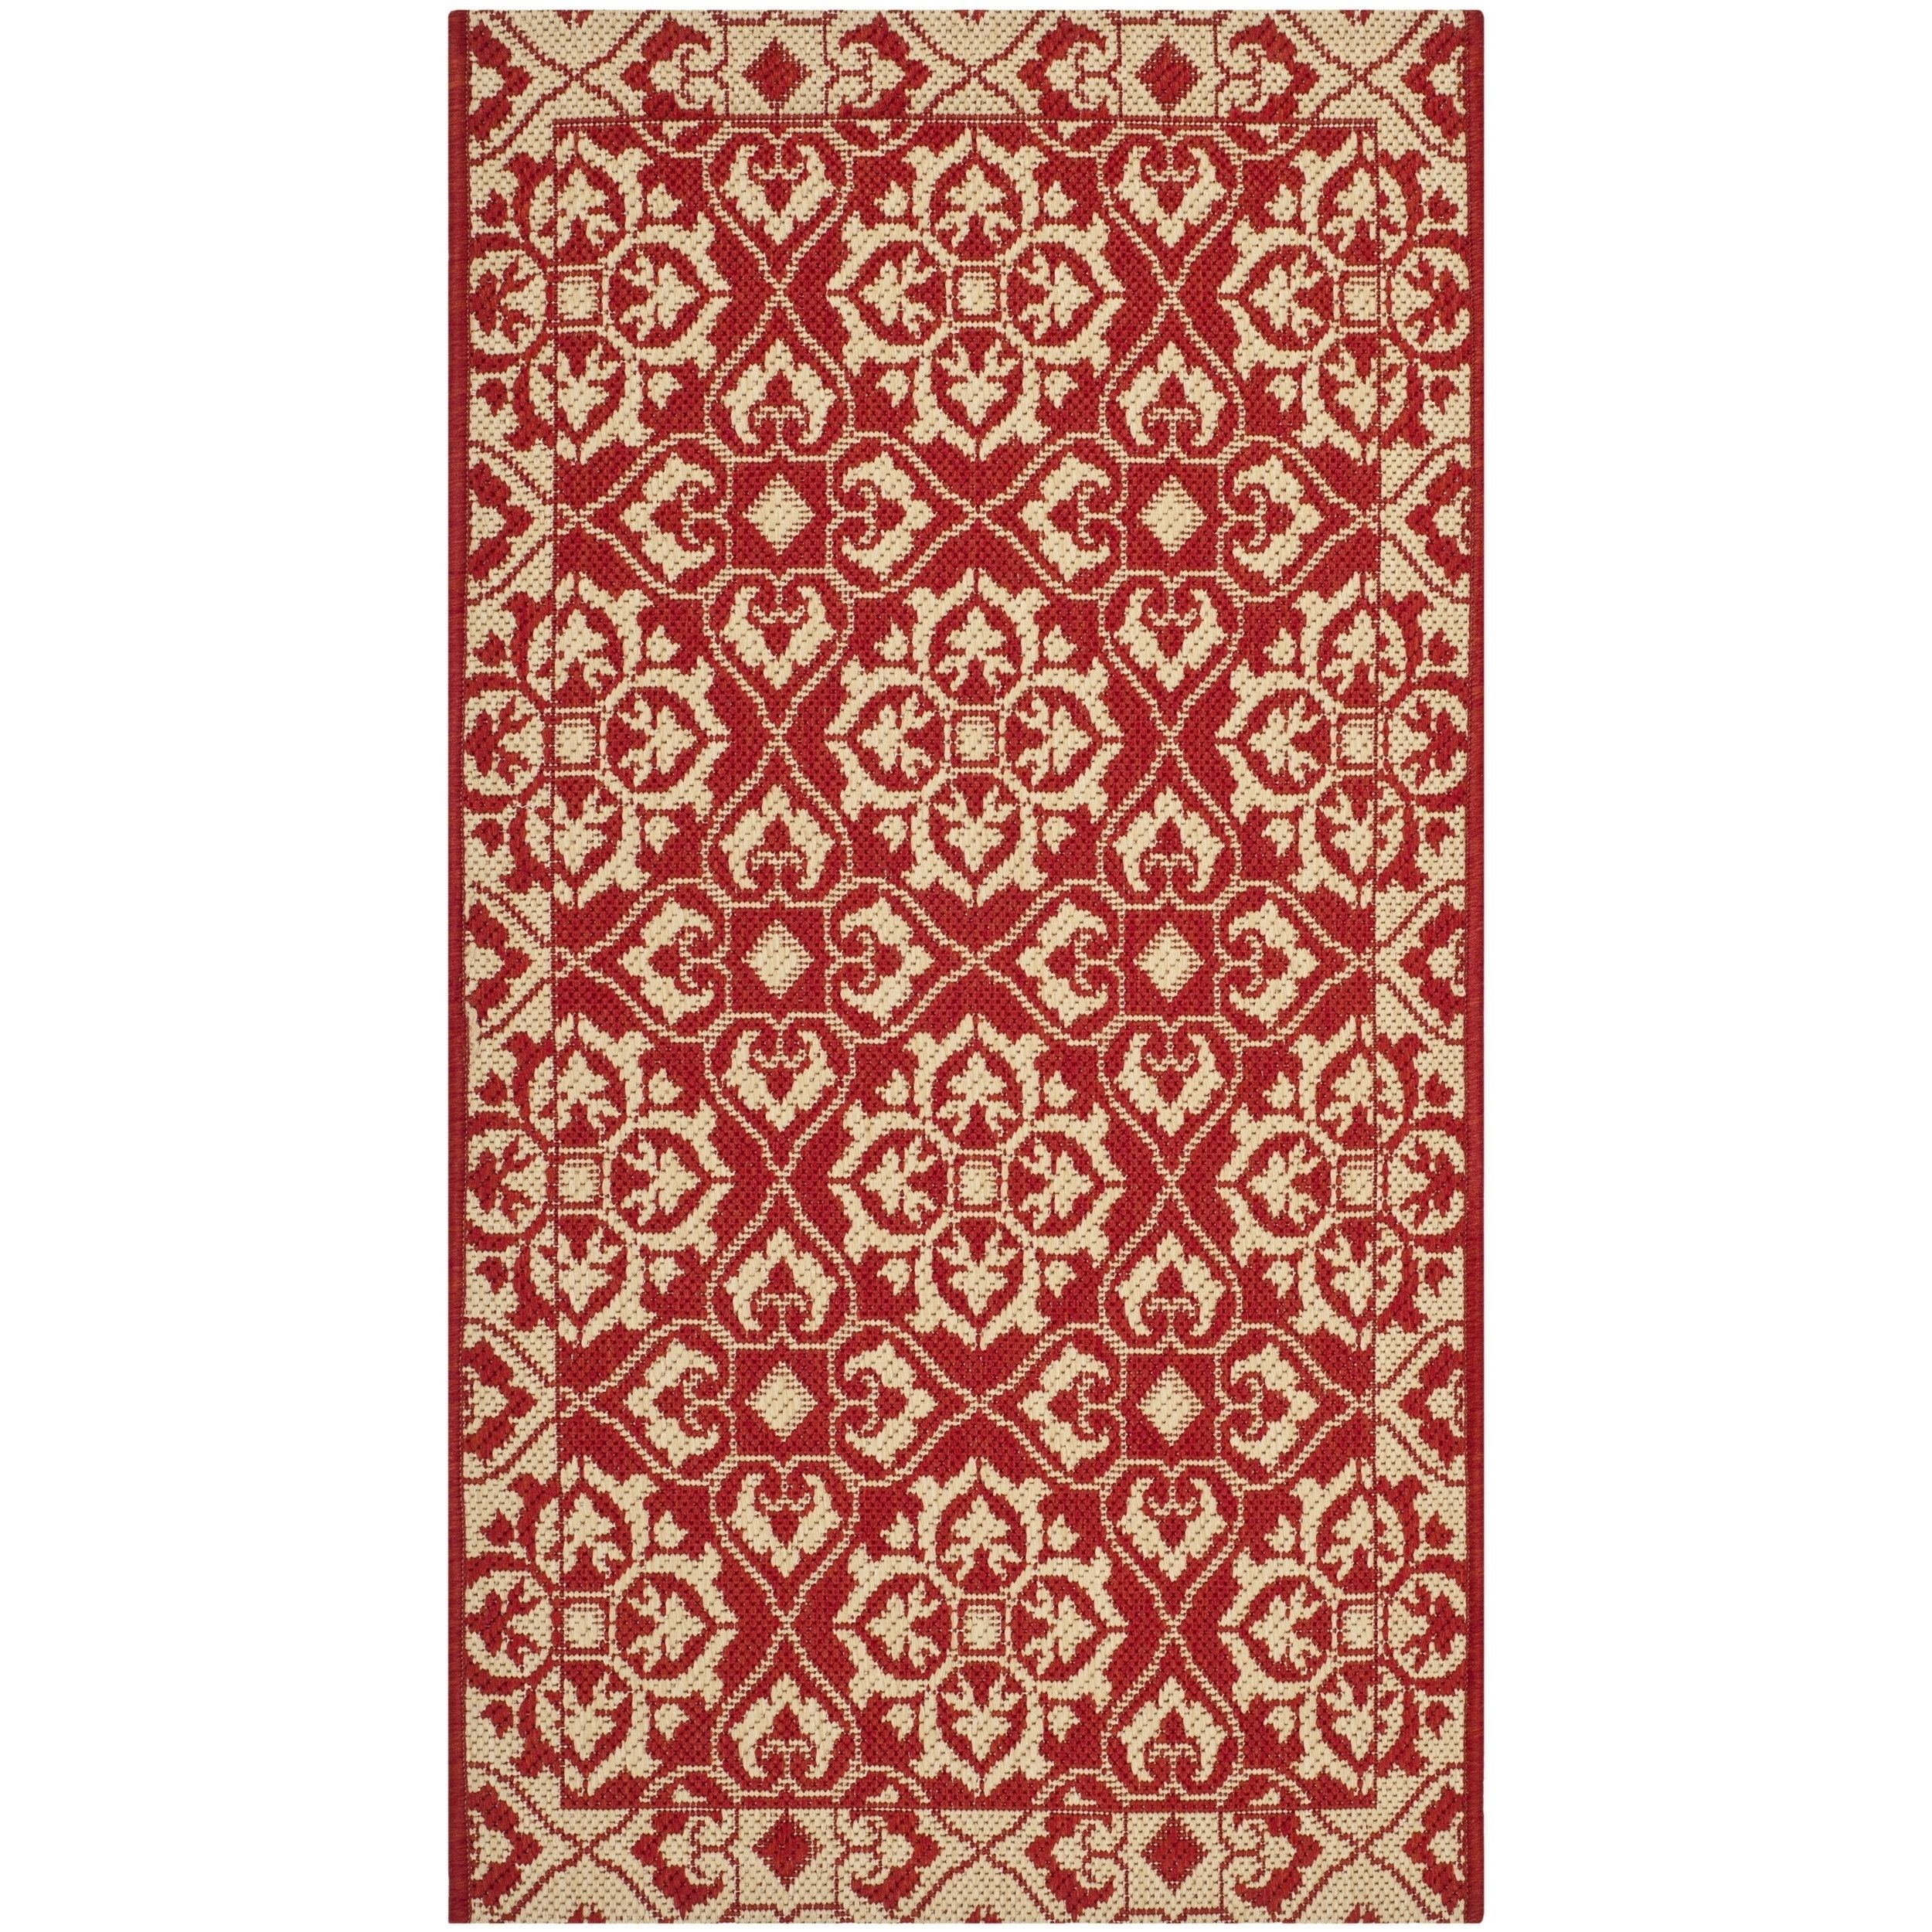 Safavieh Courtyard Elegance Red Cream Indoor Outdoor Rug 2 X 3 7 Cy6550 28 Olefin Geometric